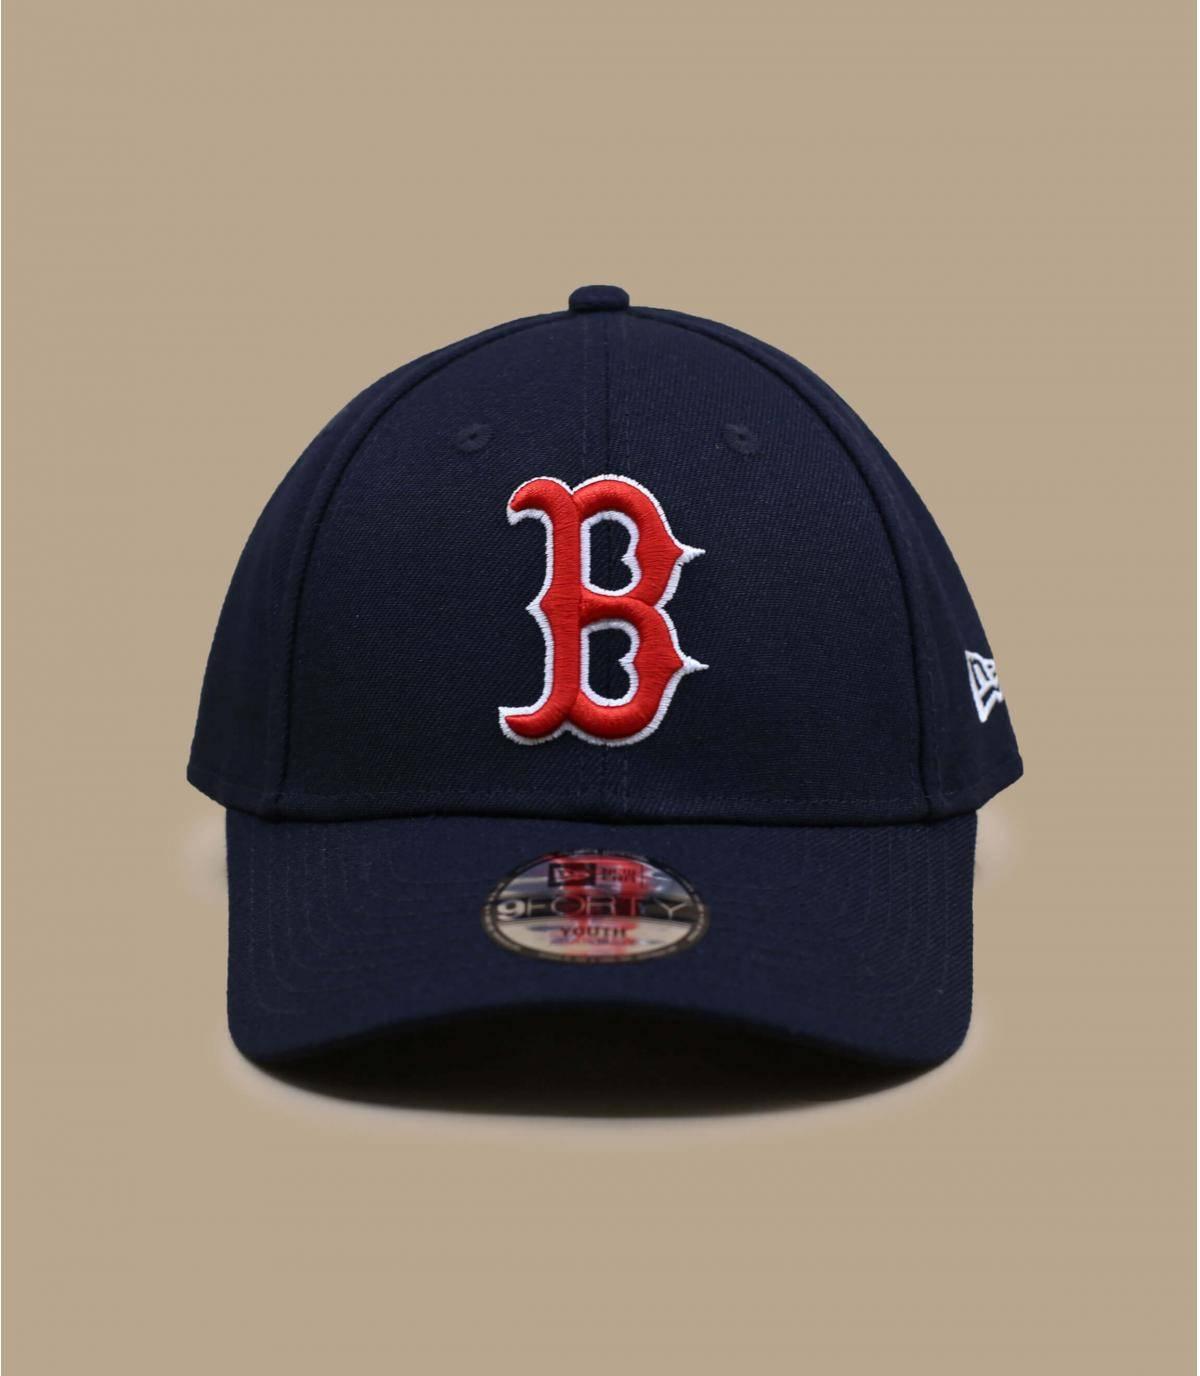 Details Kids MLB The League Boston - afbeeling 2